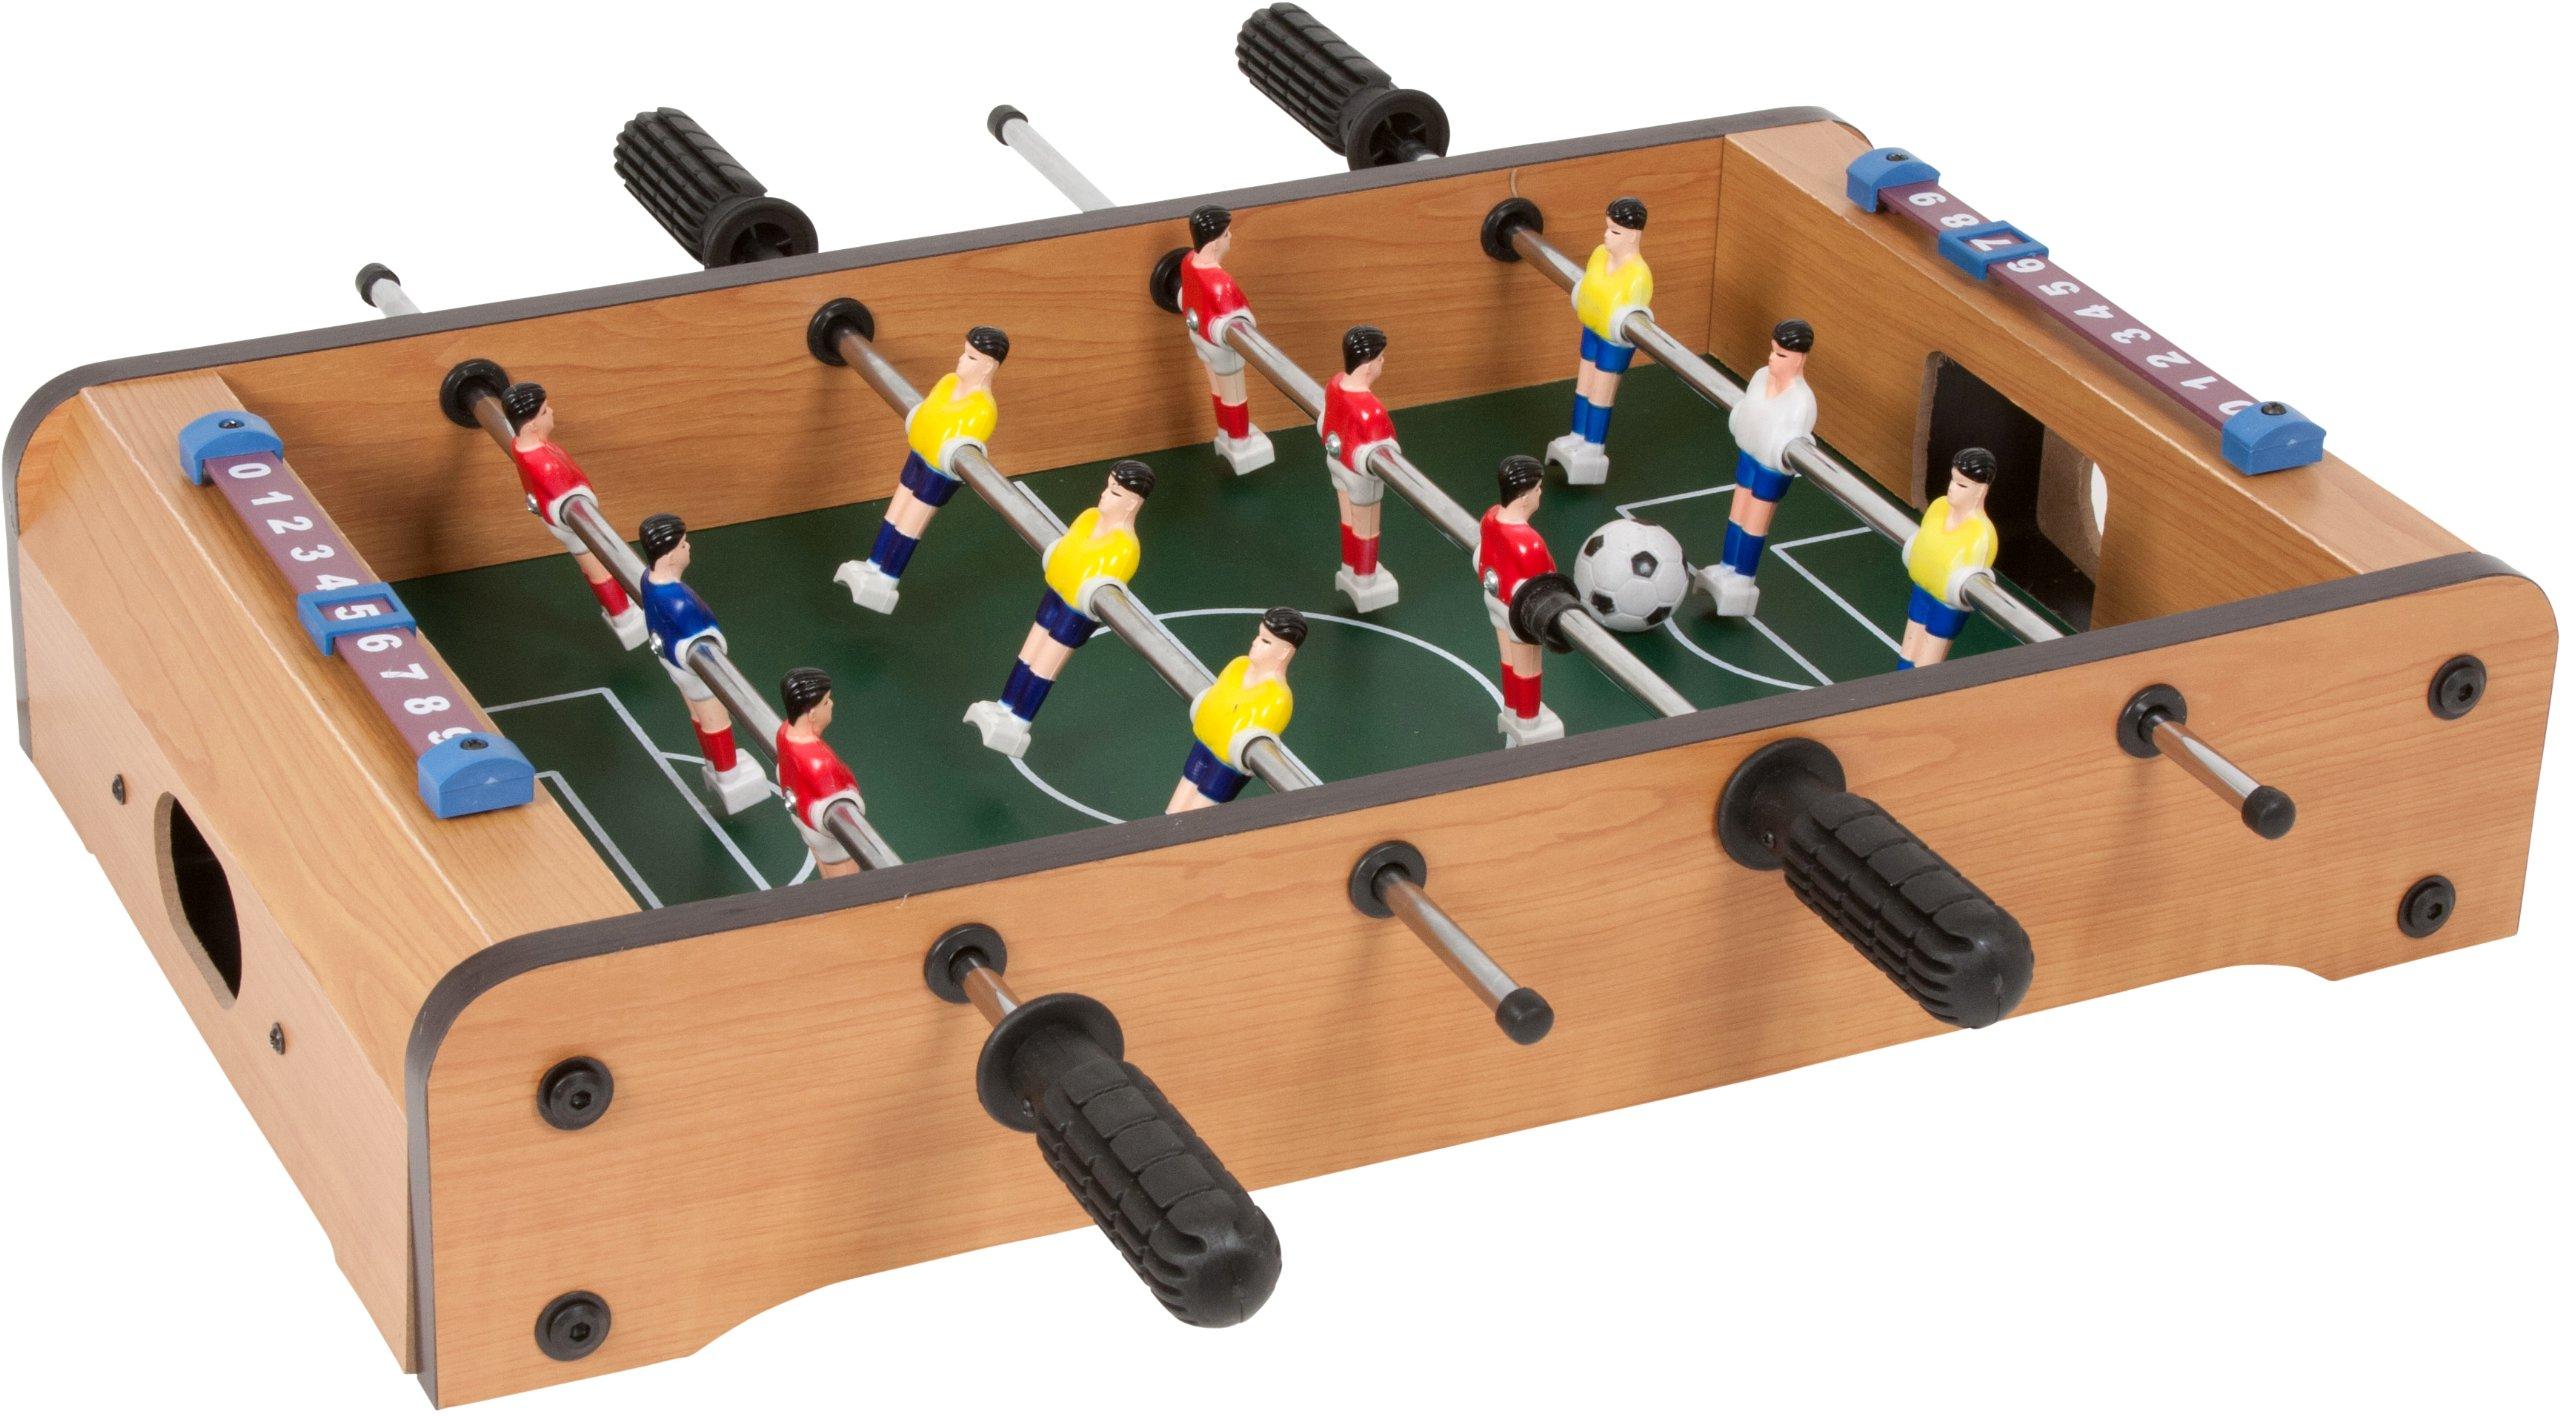 Trademark Innovations Table Top Mini Foosball Game by Trademark Innovations